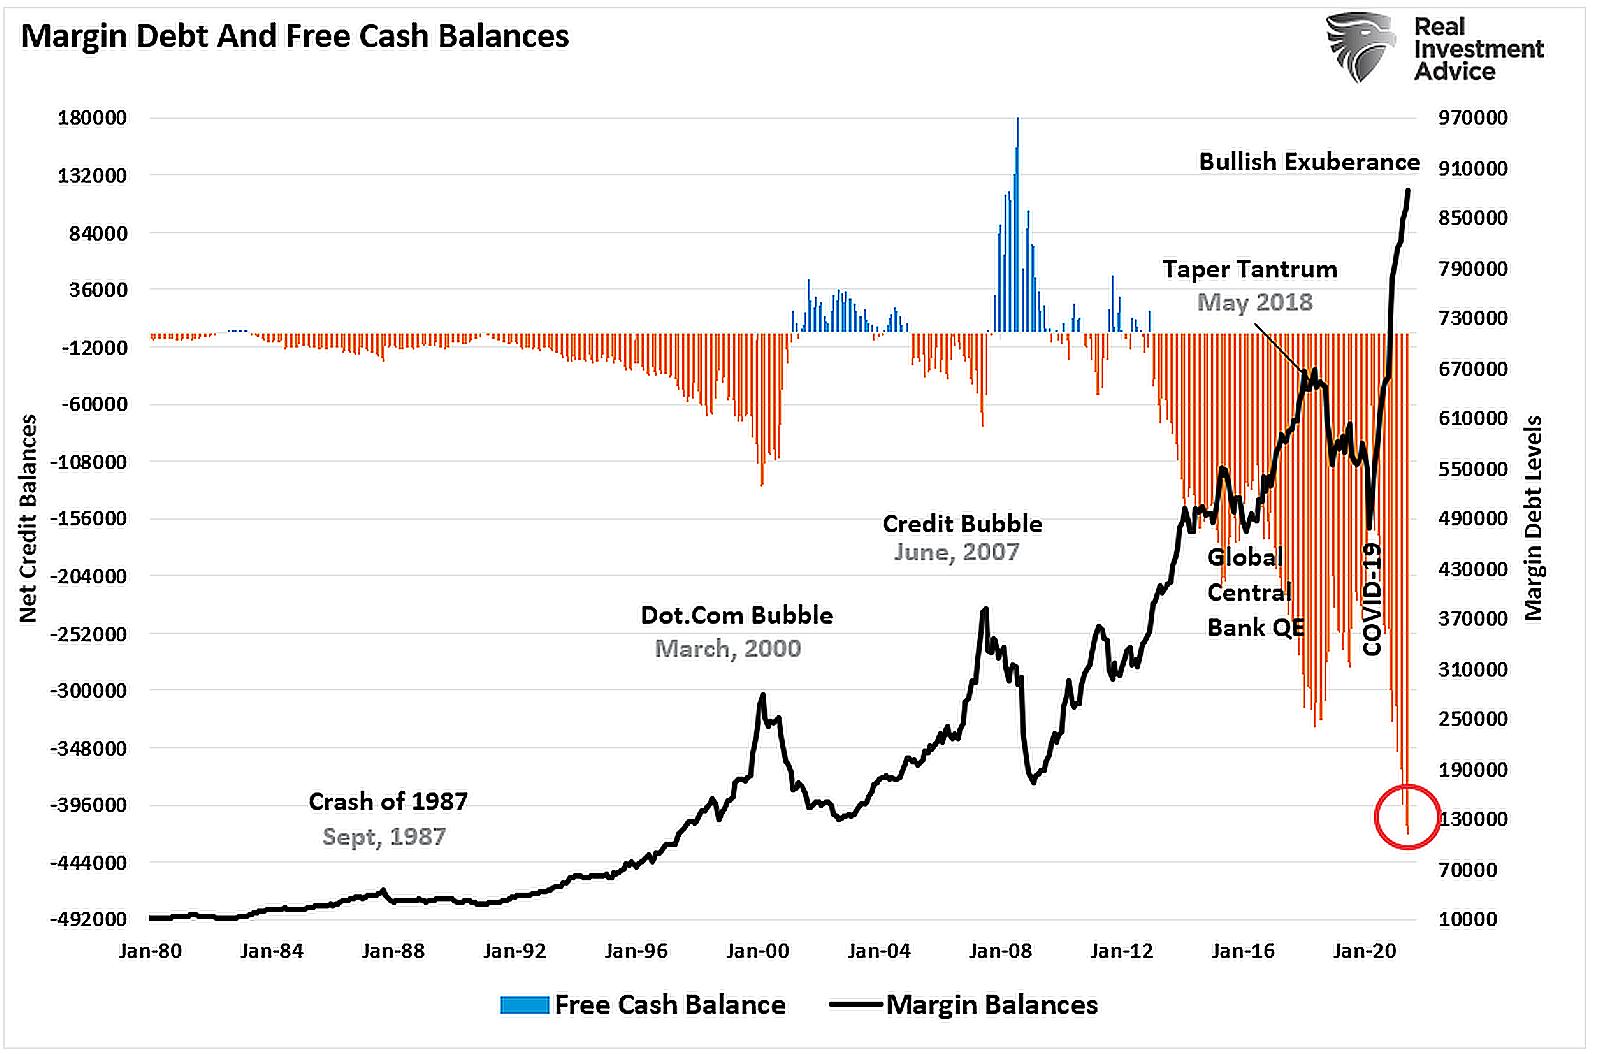 Margin-Debt-And-Free-Cash-Balances